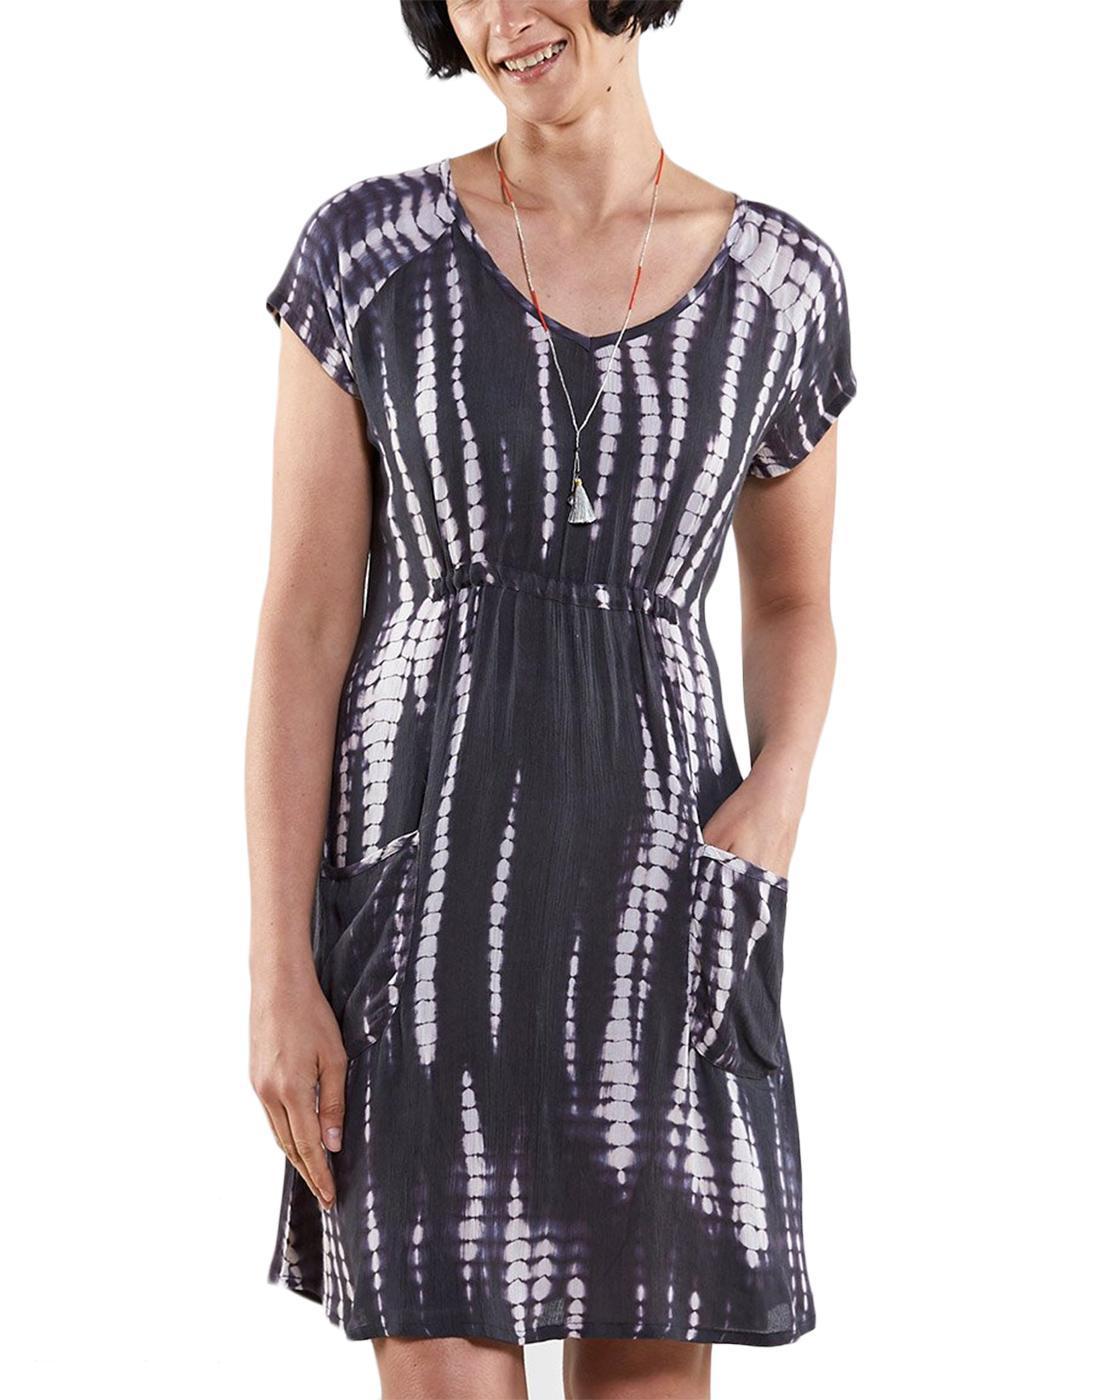 NOMADS Retro Sixties Organic Cotton Tie Dye Dress